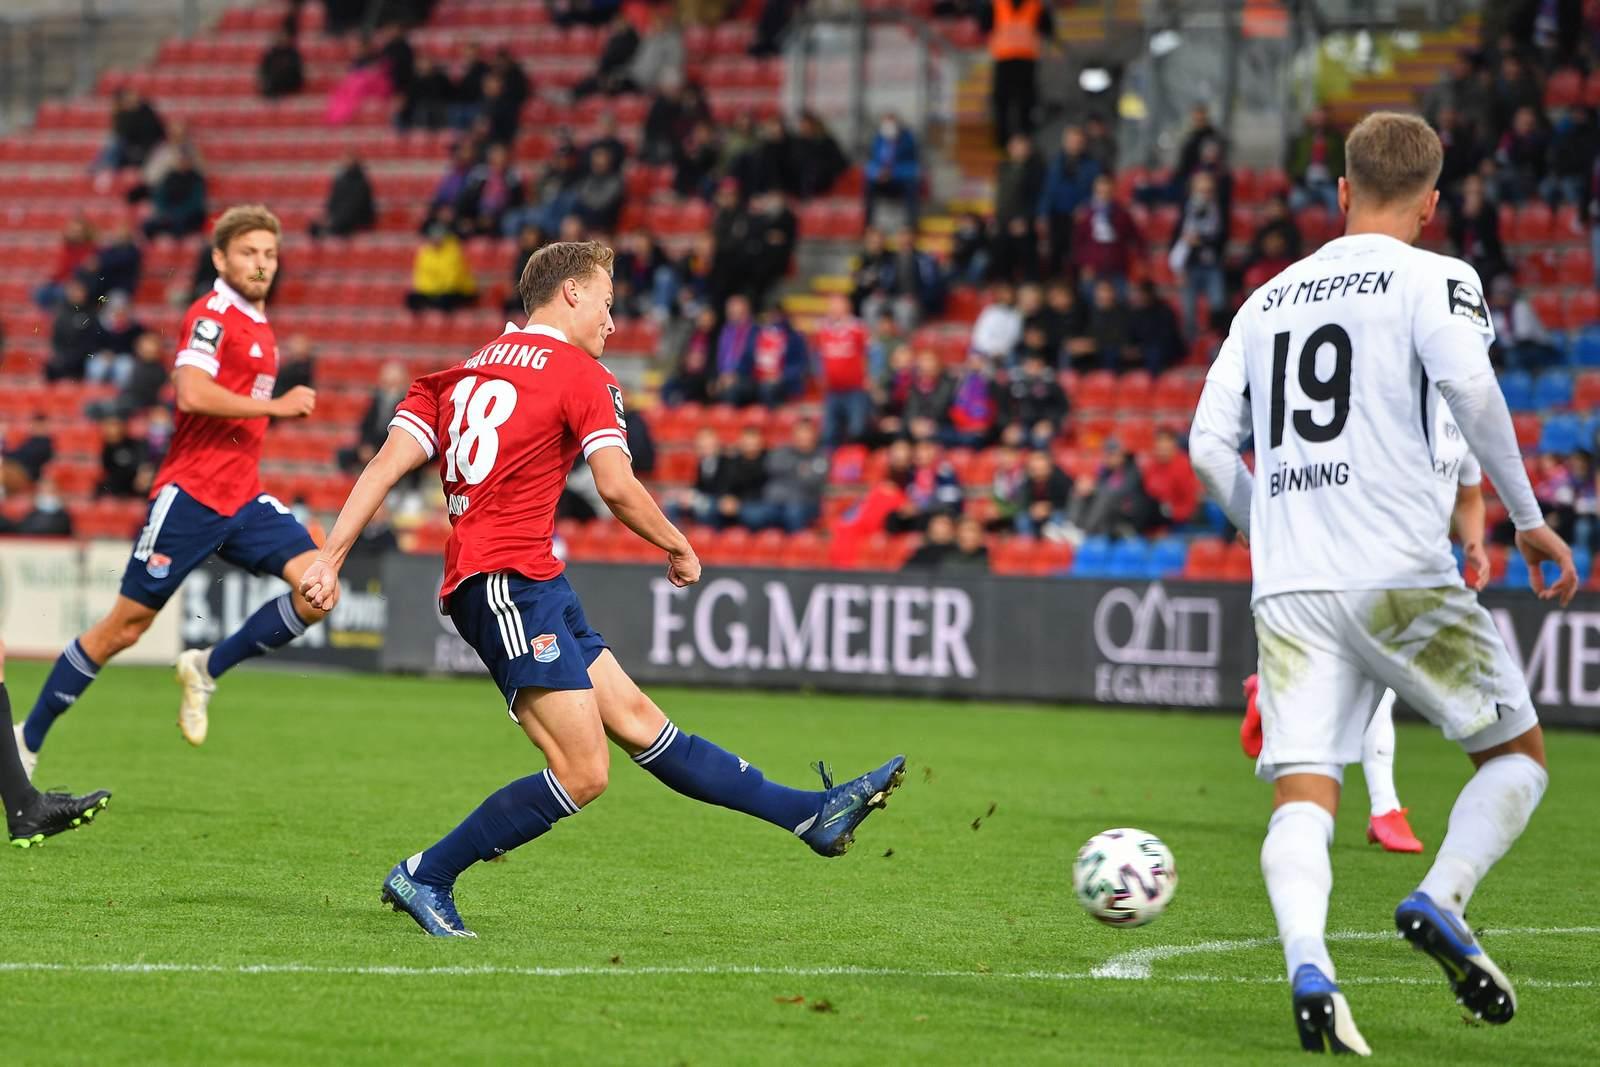 Niclas Anspach schießt das 2:1 gegen den SV Meppen